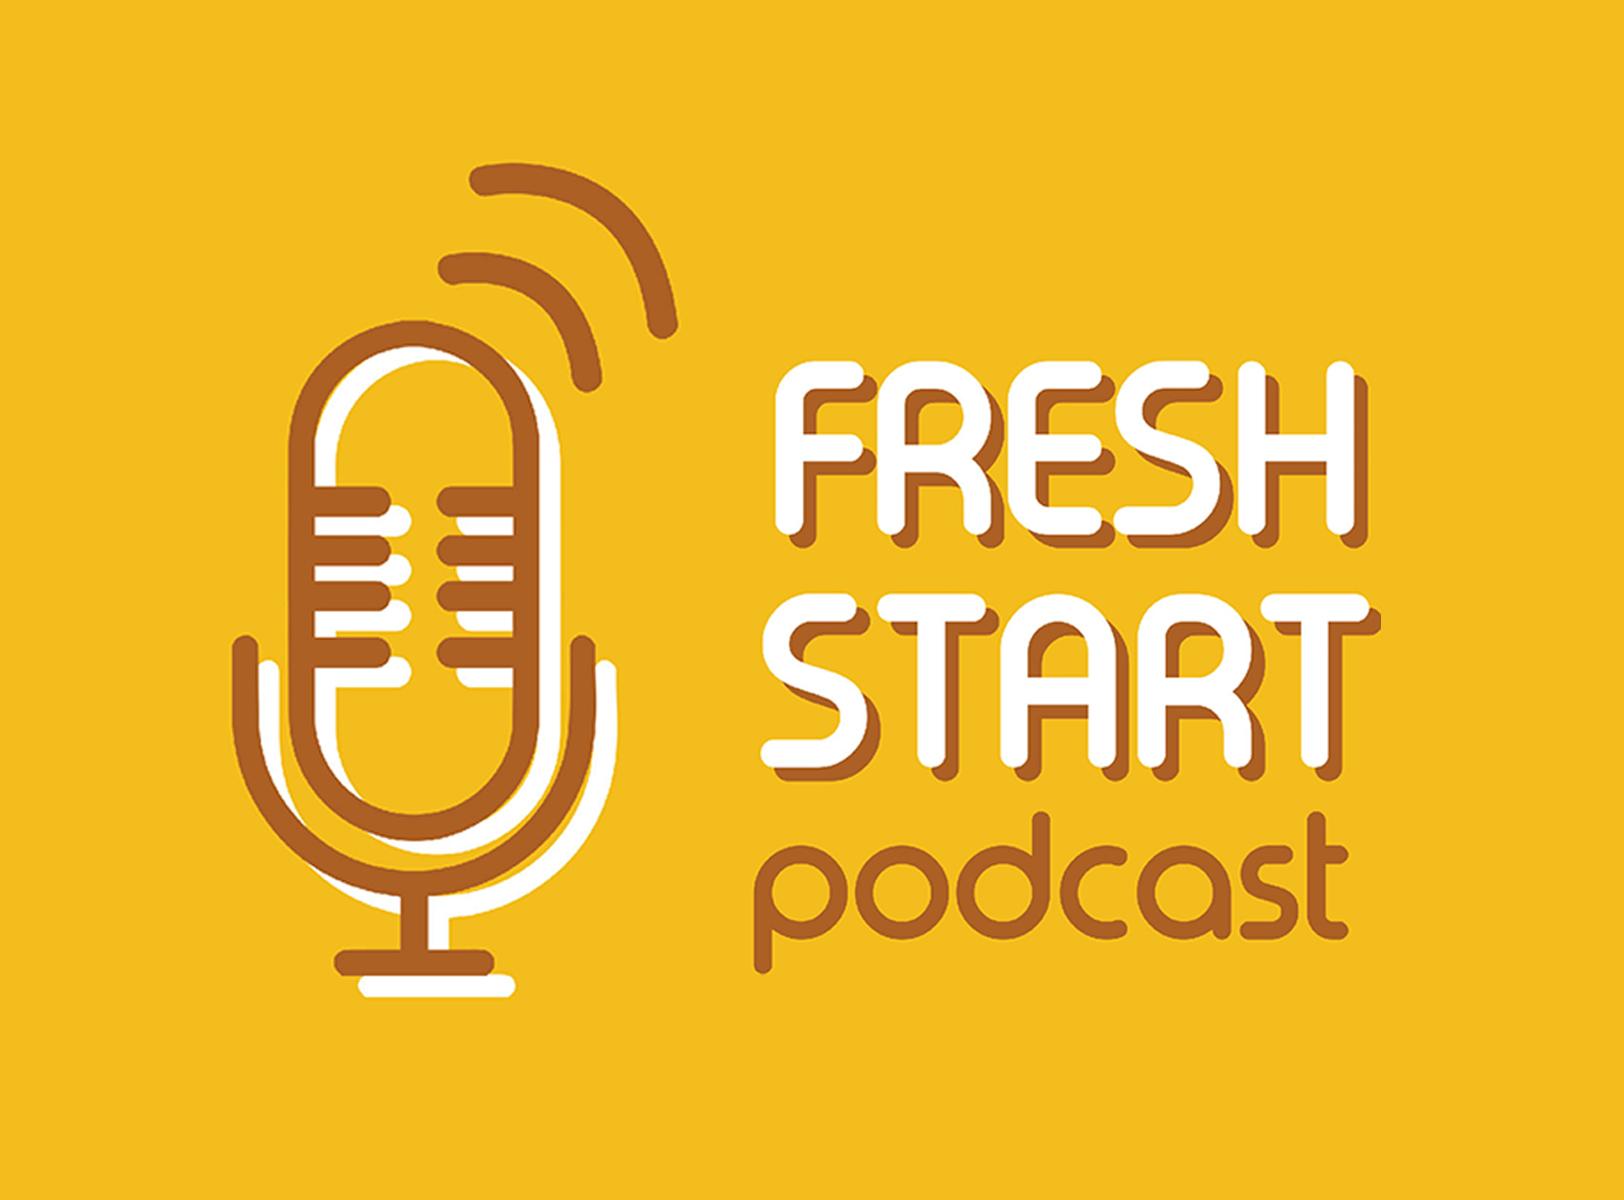 Fresh Start: Podcast News (12/27/2019 Fri.)